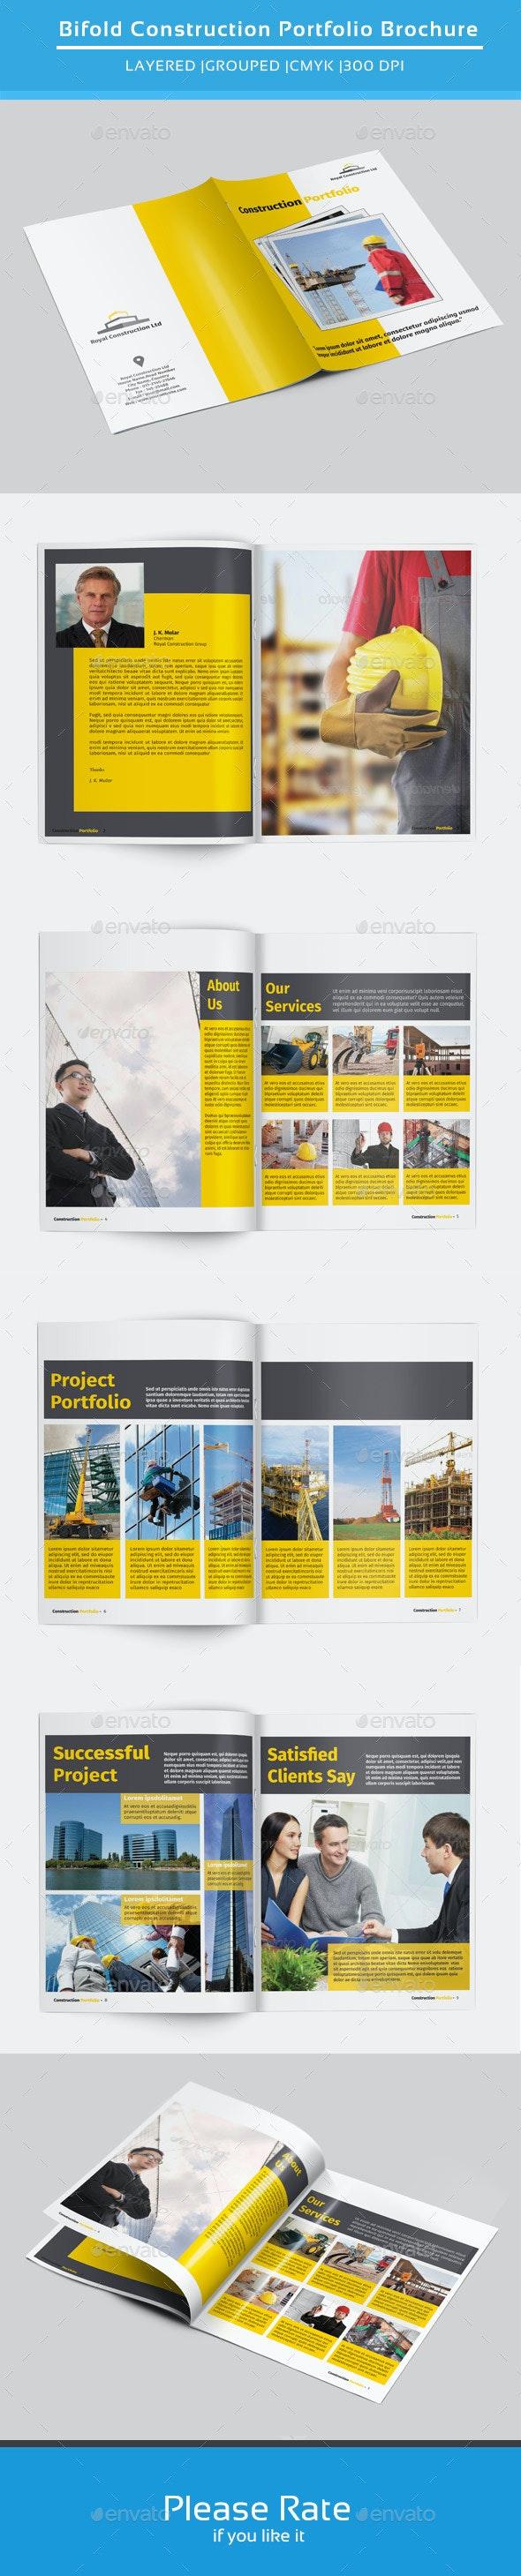 Bifold Brochure for Construction-V141 - Corporate Brochures